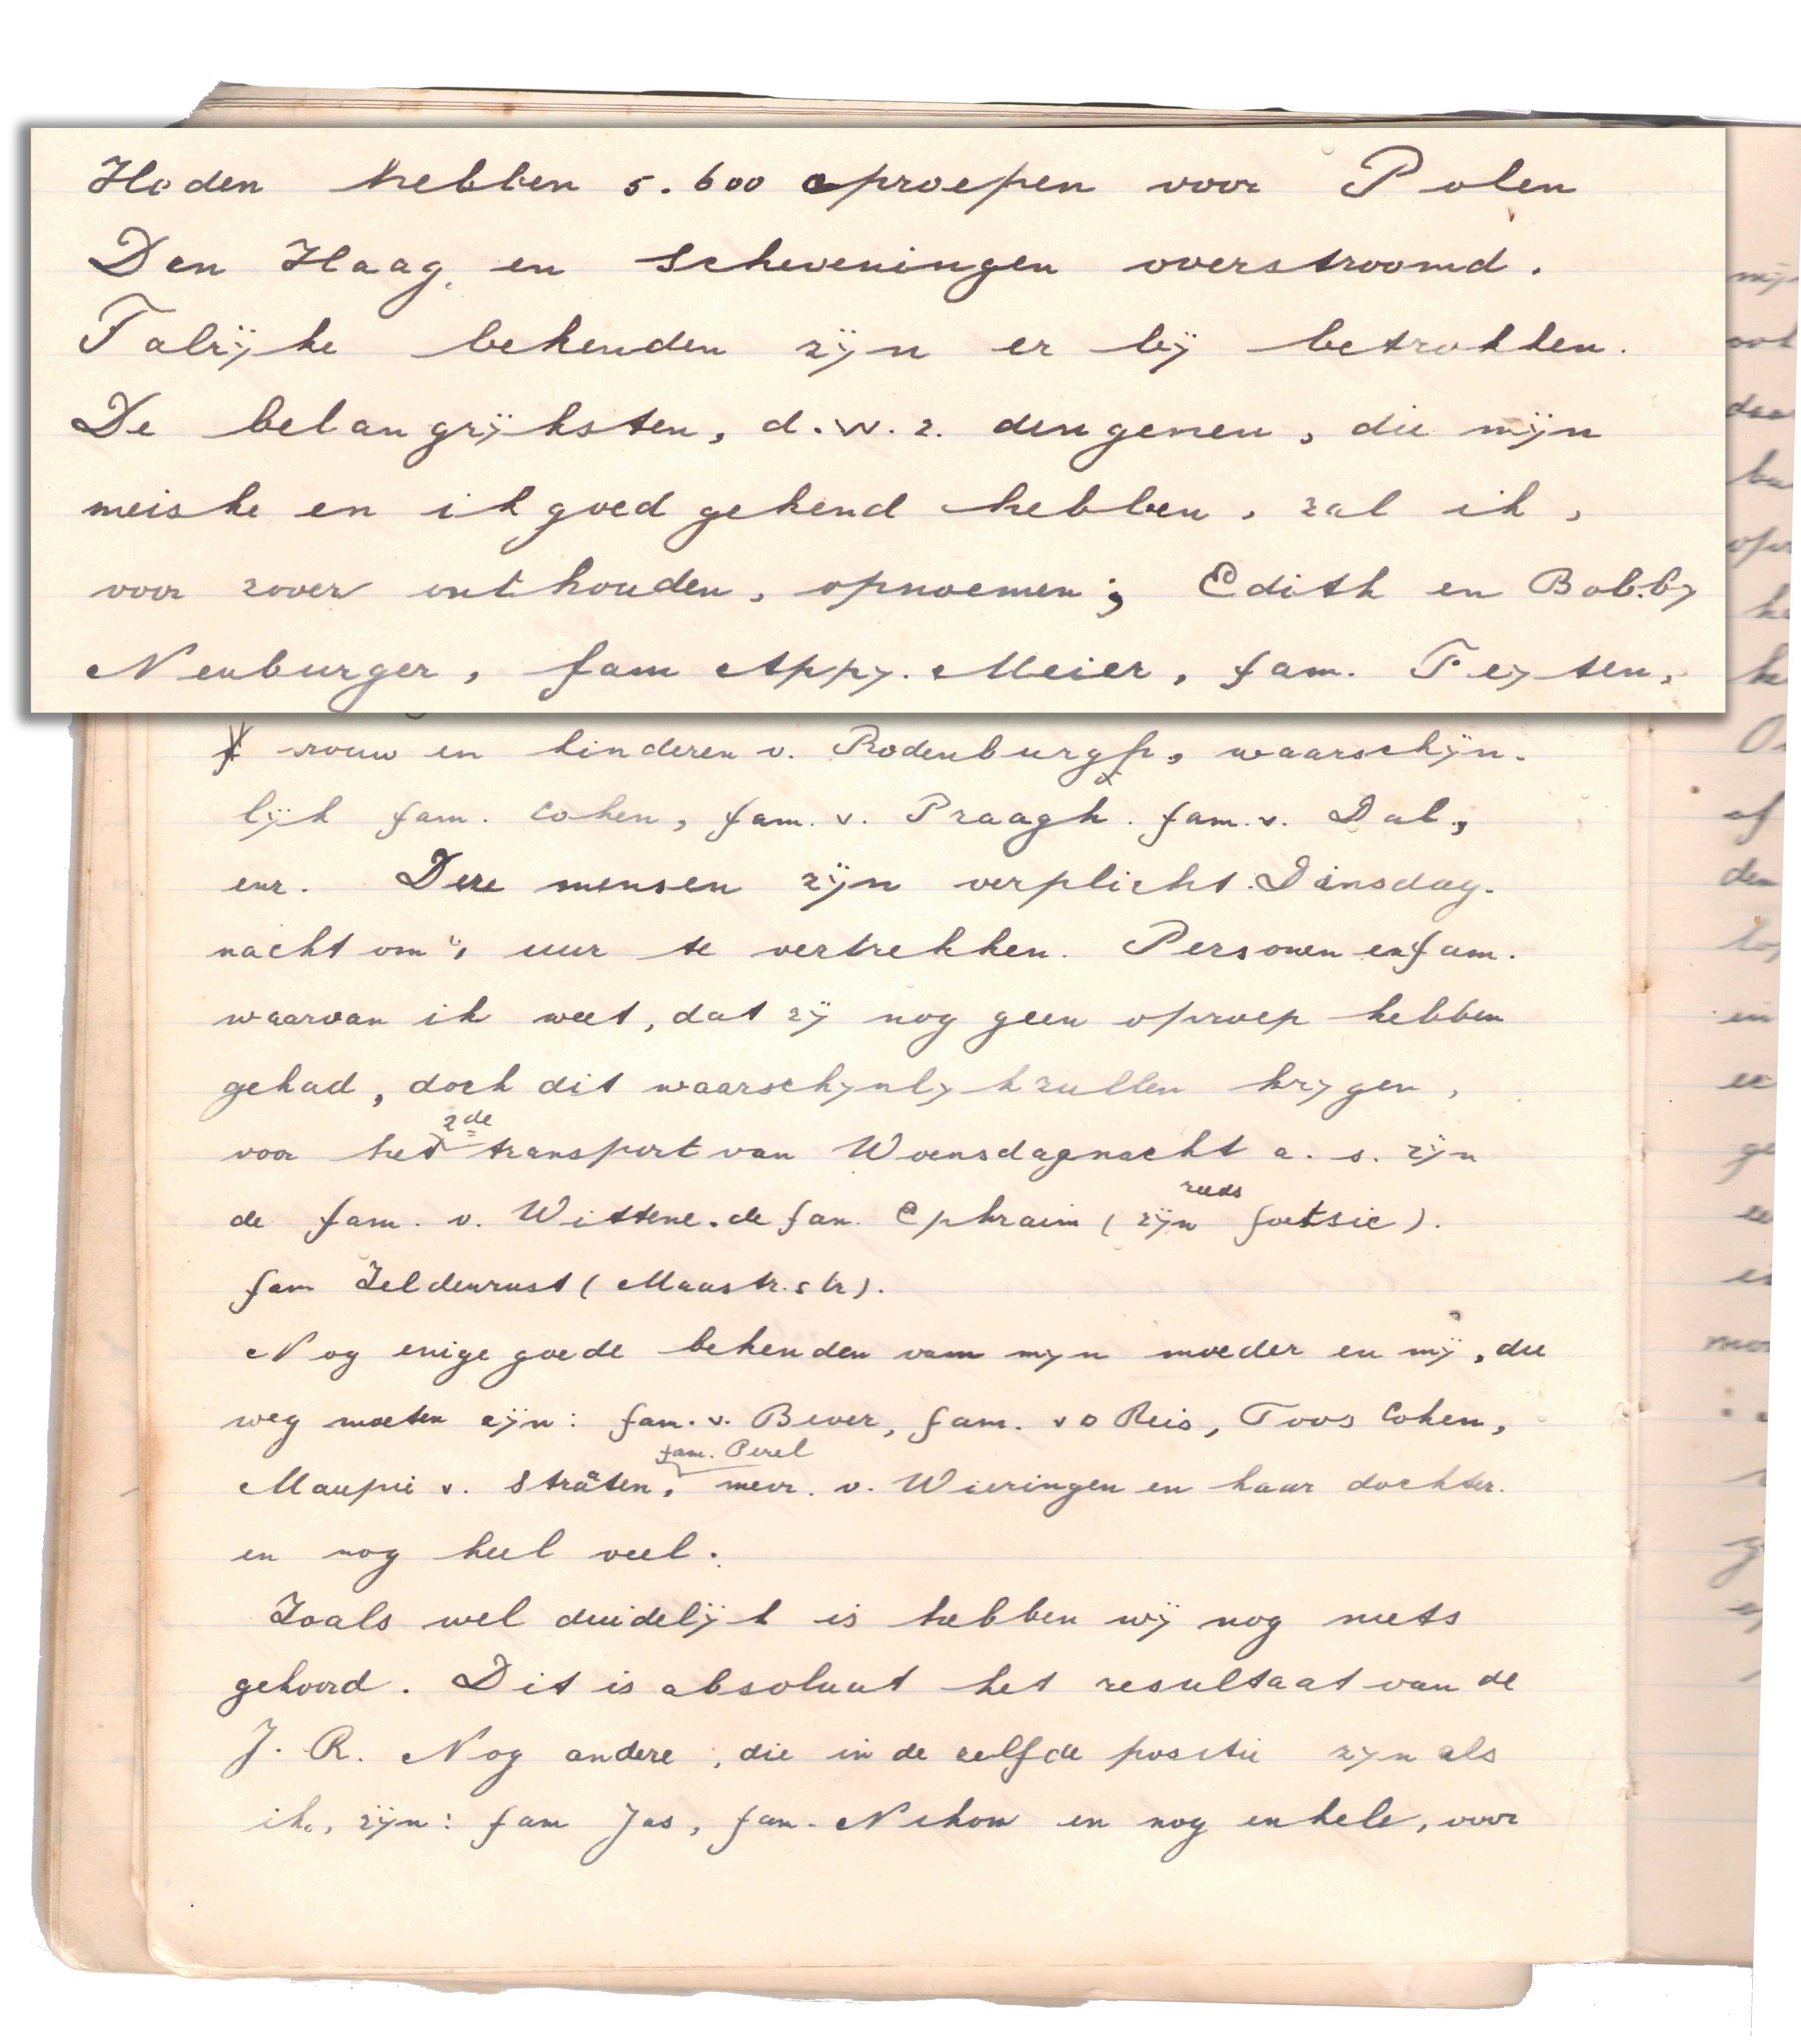 Bernie's dagboekbrief van 17 augustus 1942